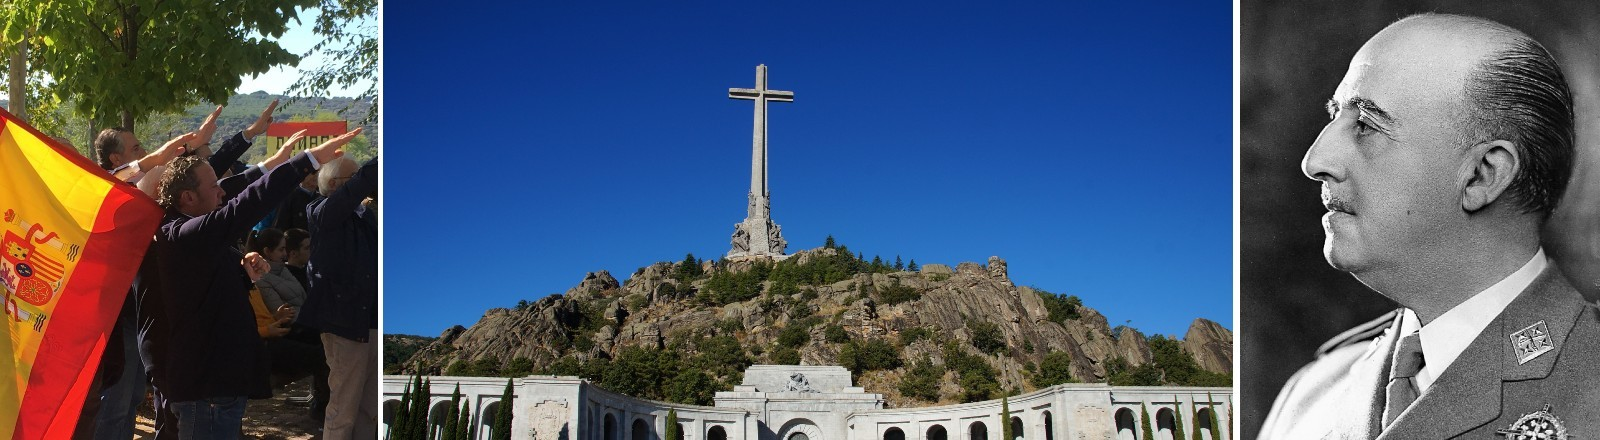 Anhänger Francos im Jahr 2019, das Mausoleum, Porträt des Diktators Francisco Franco